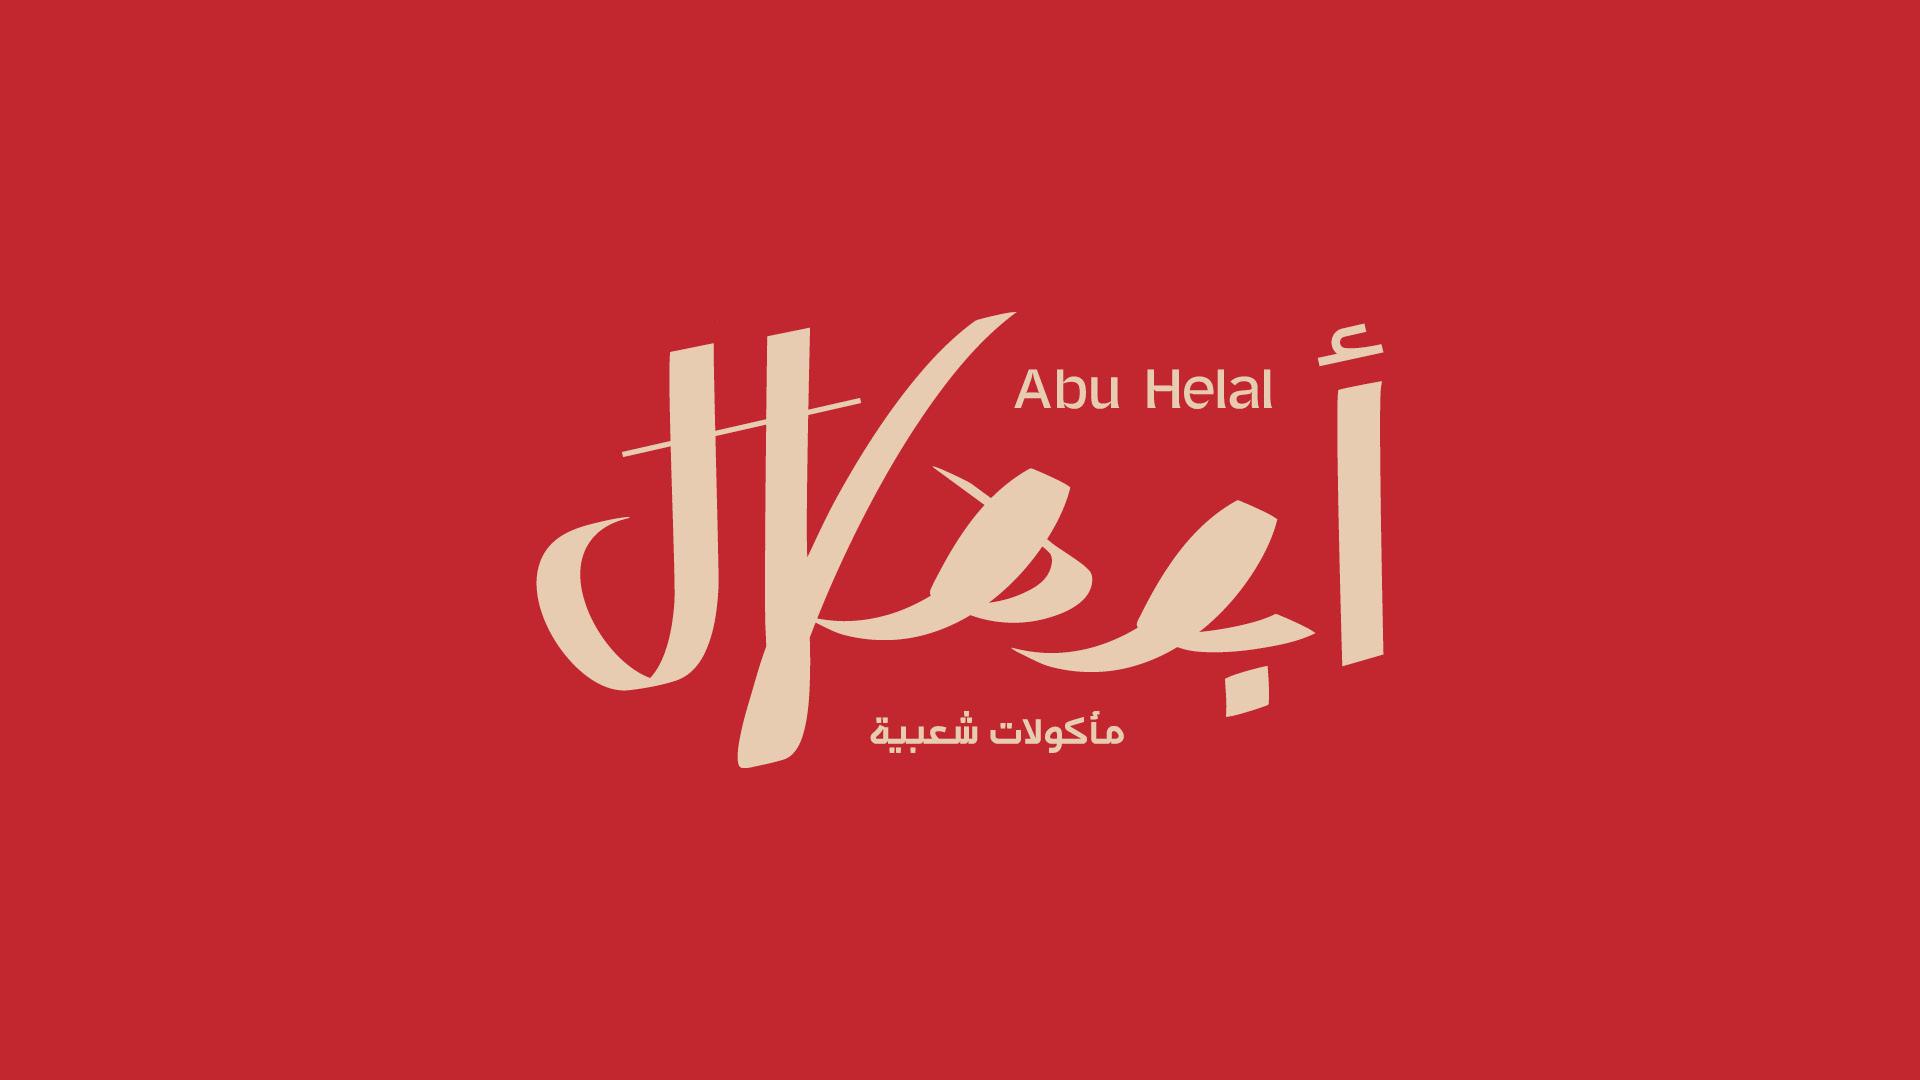 AbuHelal-Work-By-YaStudio-19